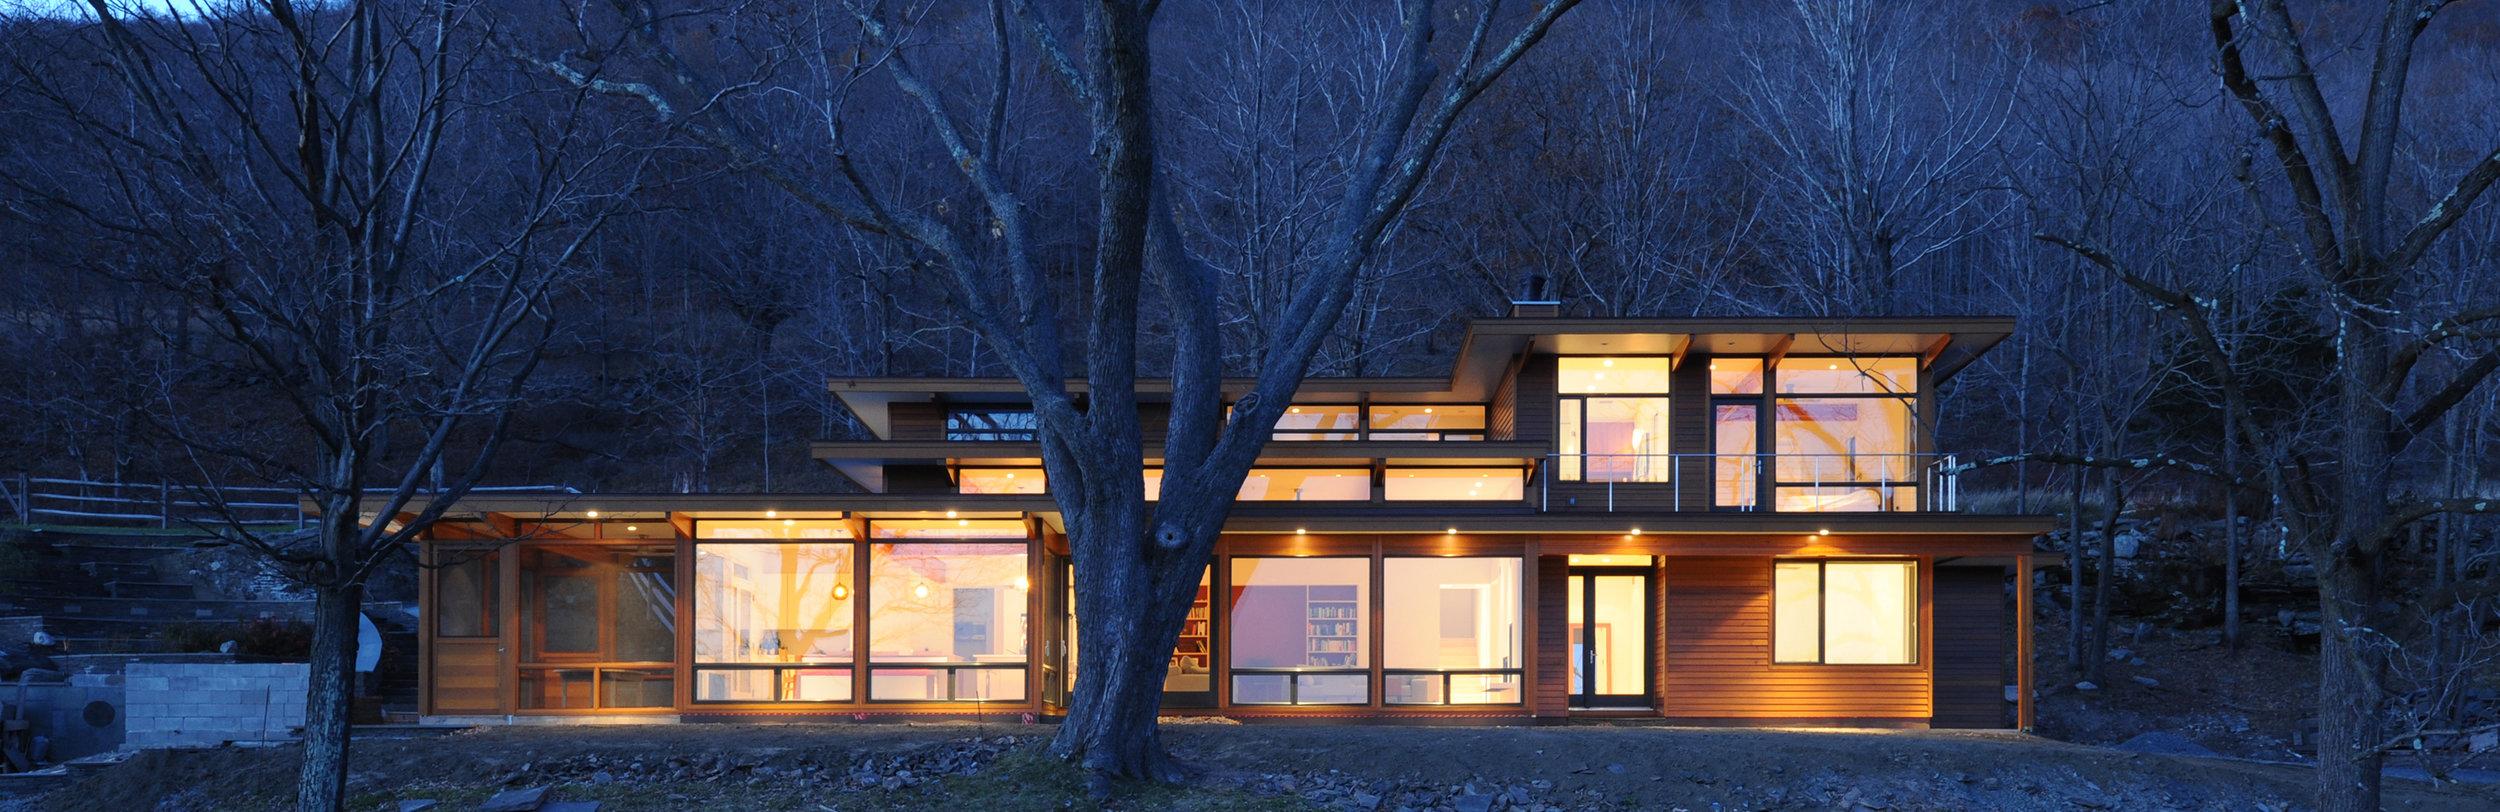 turkel_modern_design_prefab_home_reservoir_shokan_NY_exterior_night.jpg